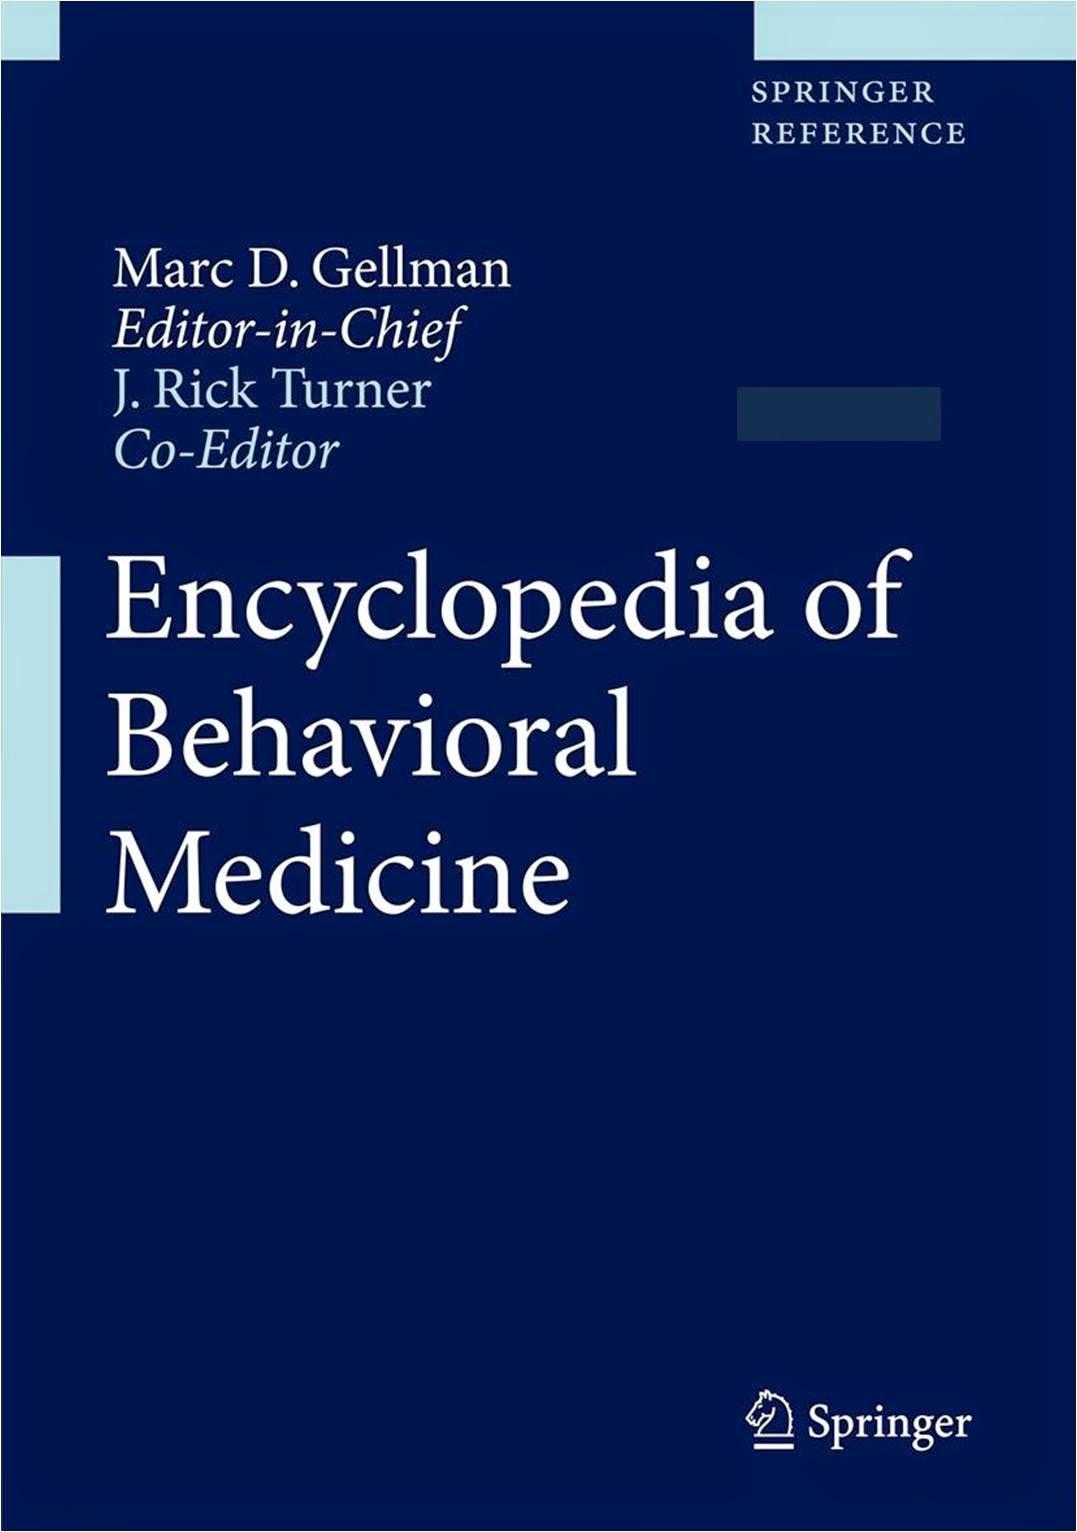 http://kingcheapebook.blogspot.com/2014/08/encyclopedia-of-behavioral-medicine.html